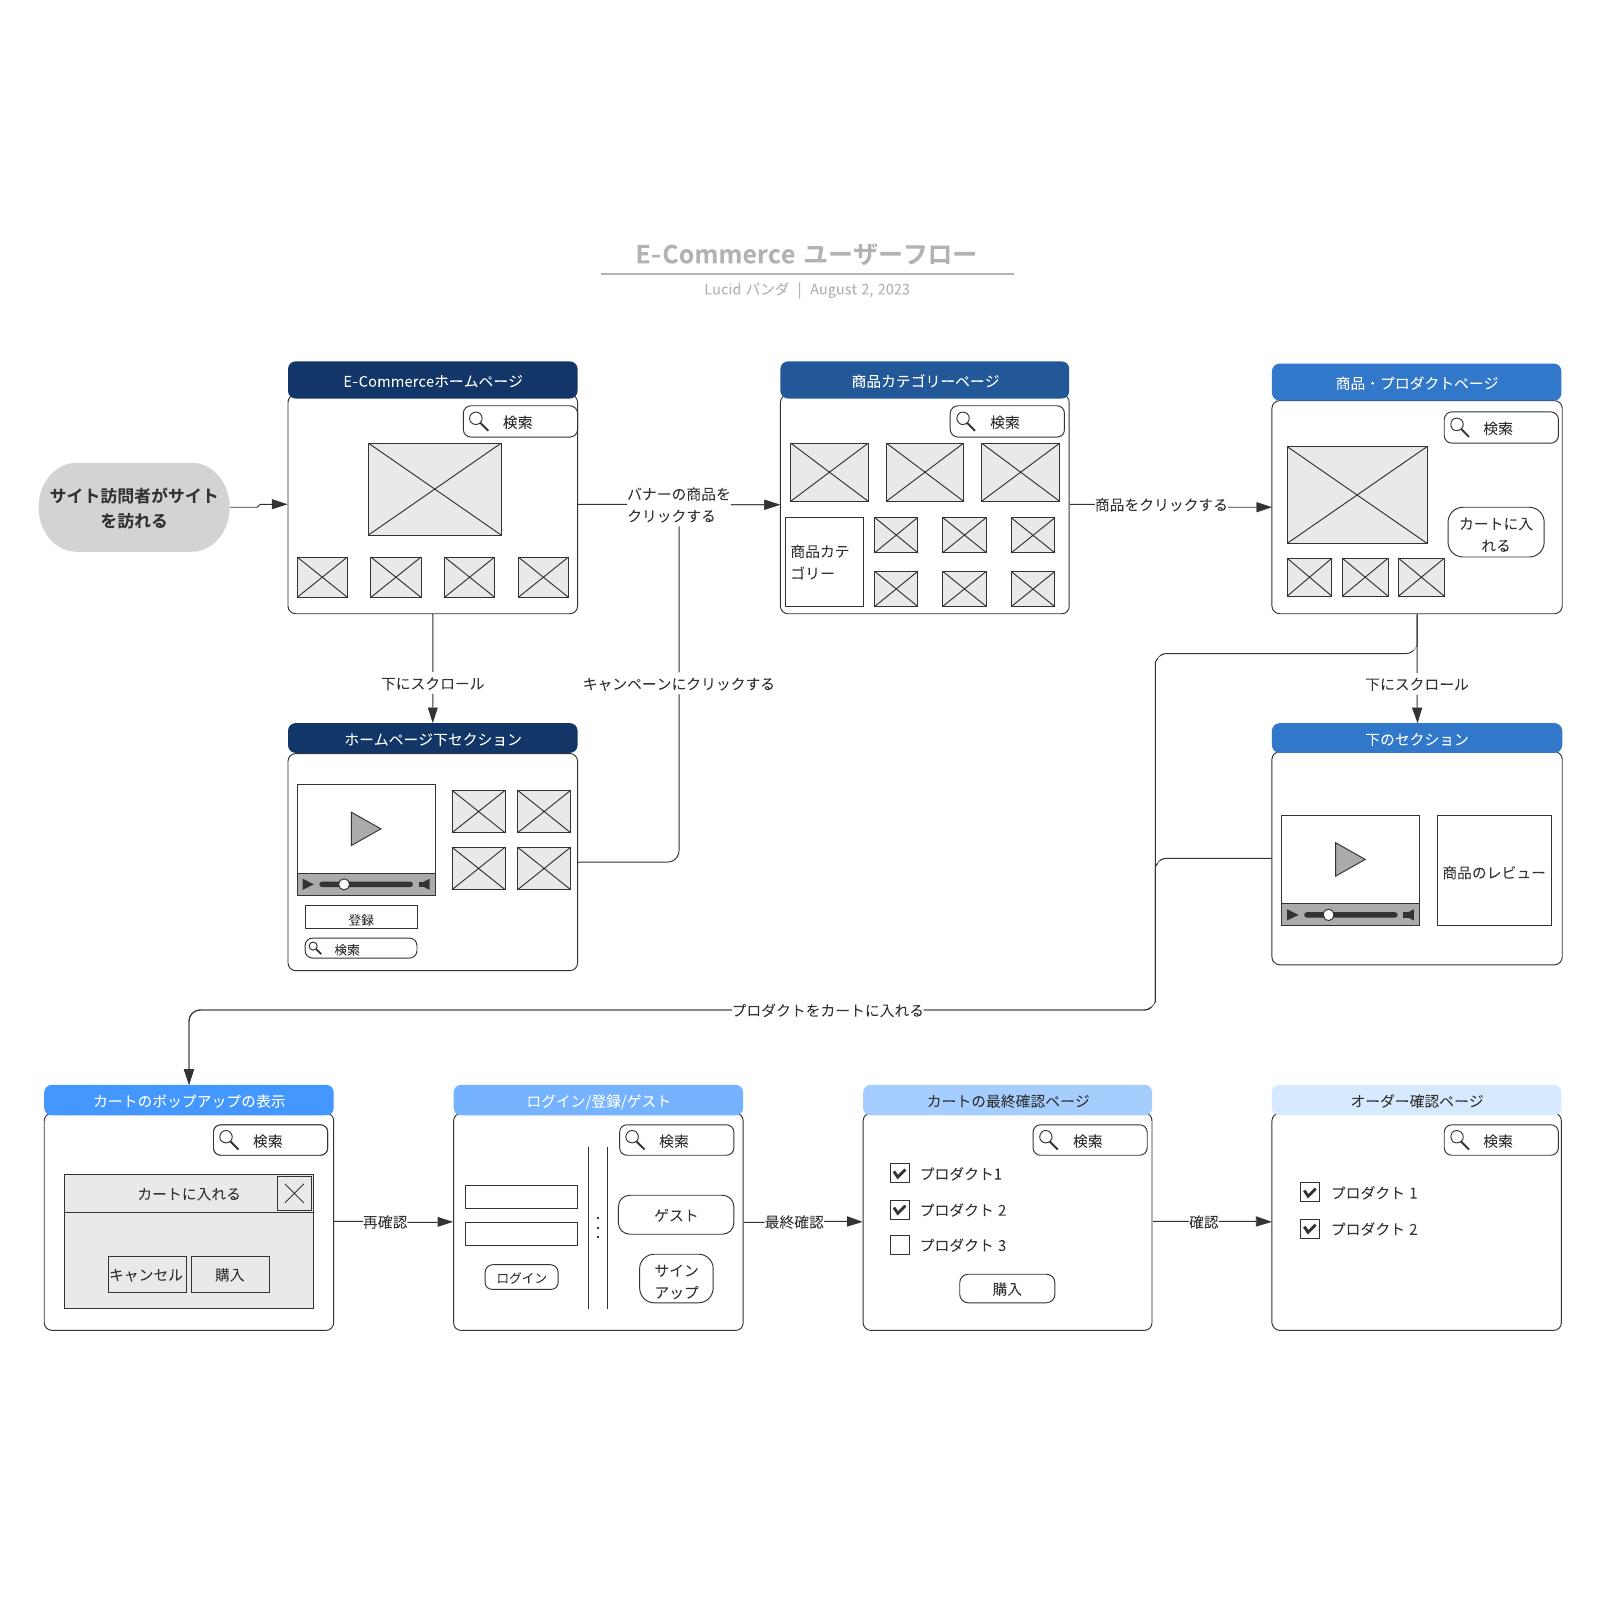 E-Commerce ユーザーフローテンプレート